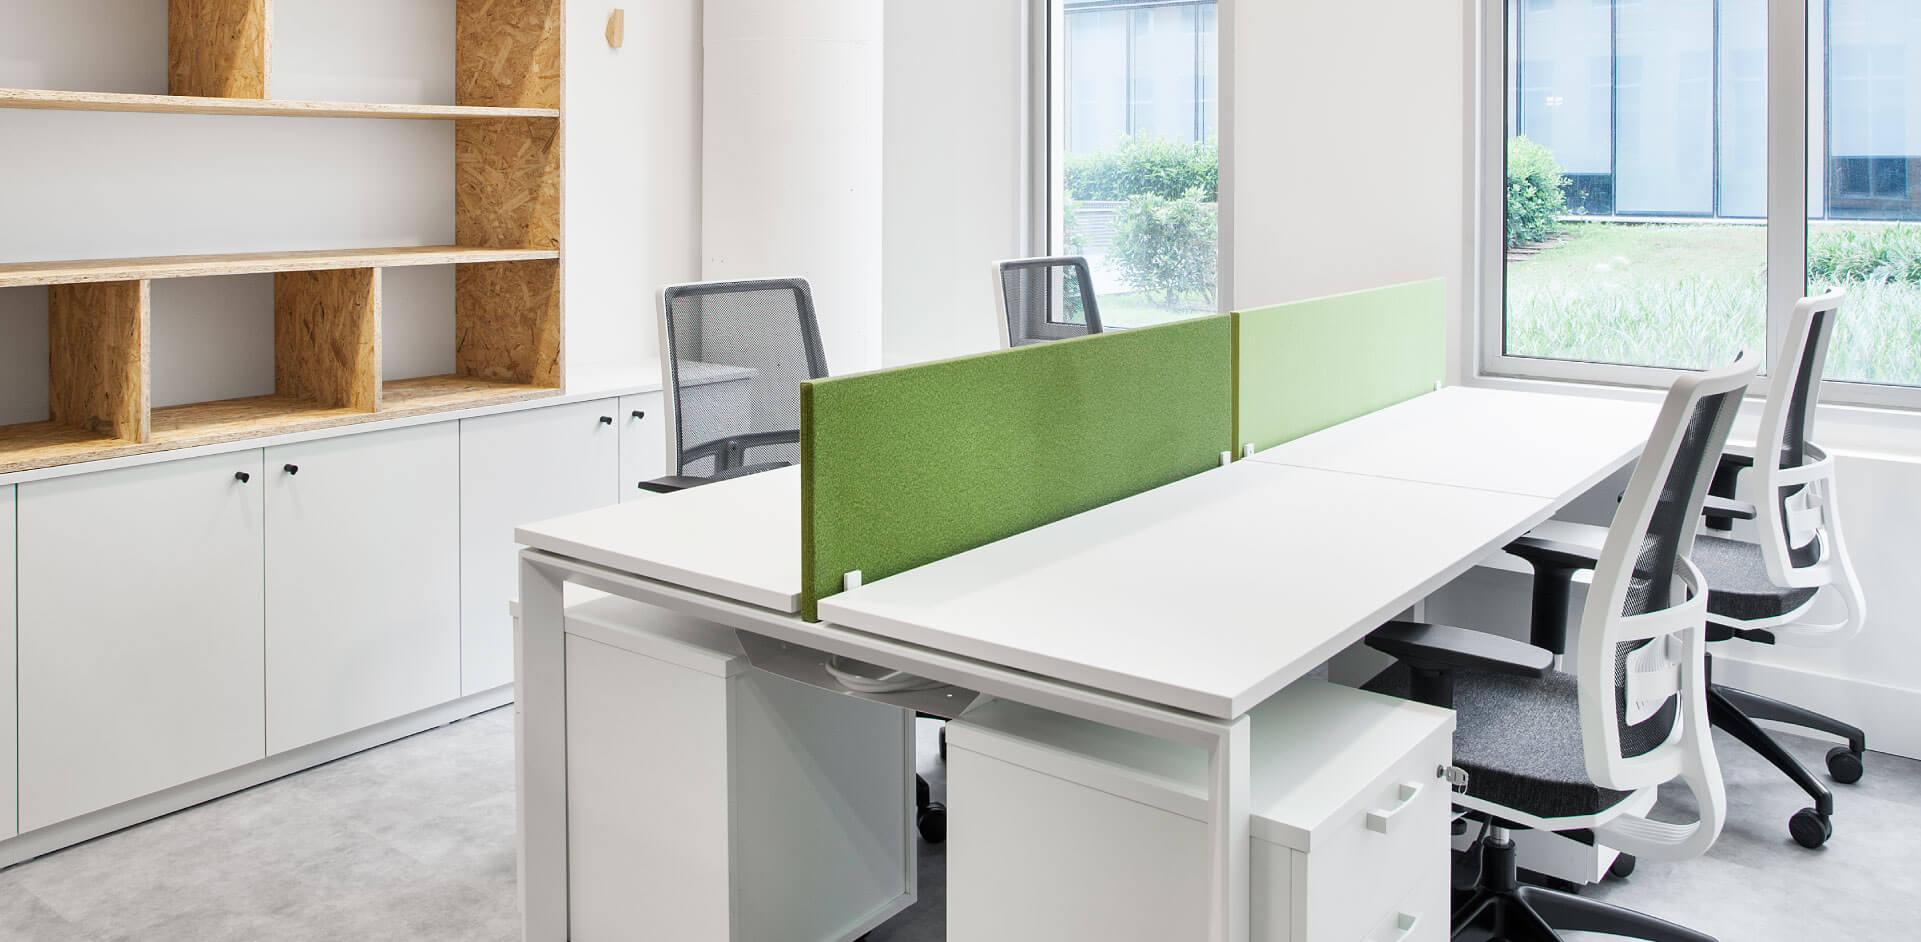 Despacho 4 Pax